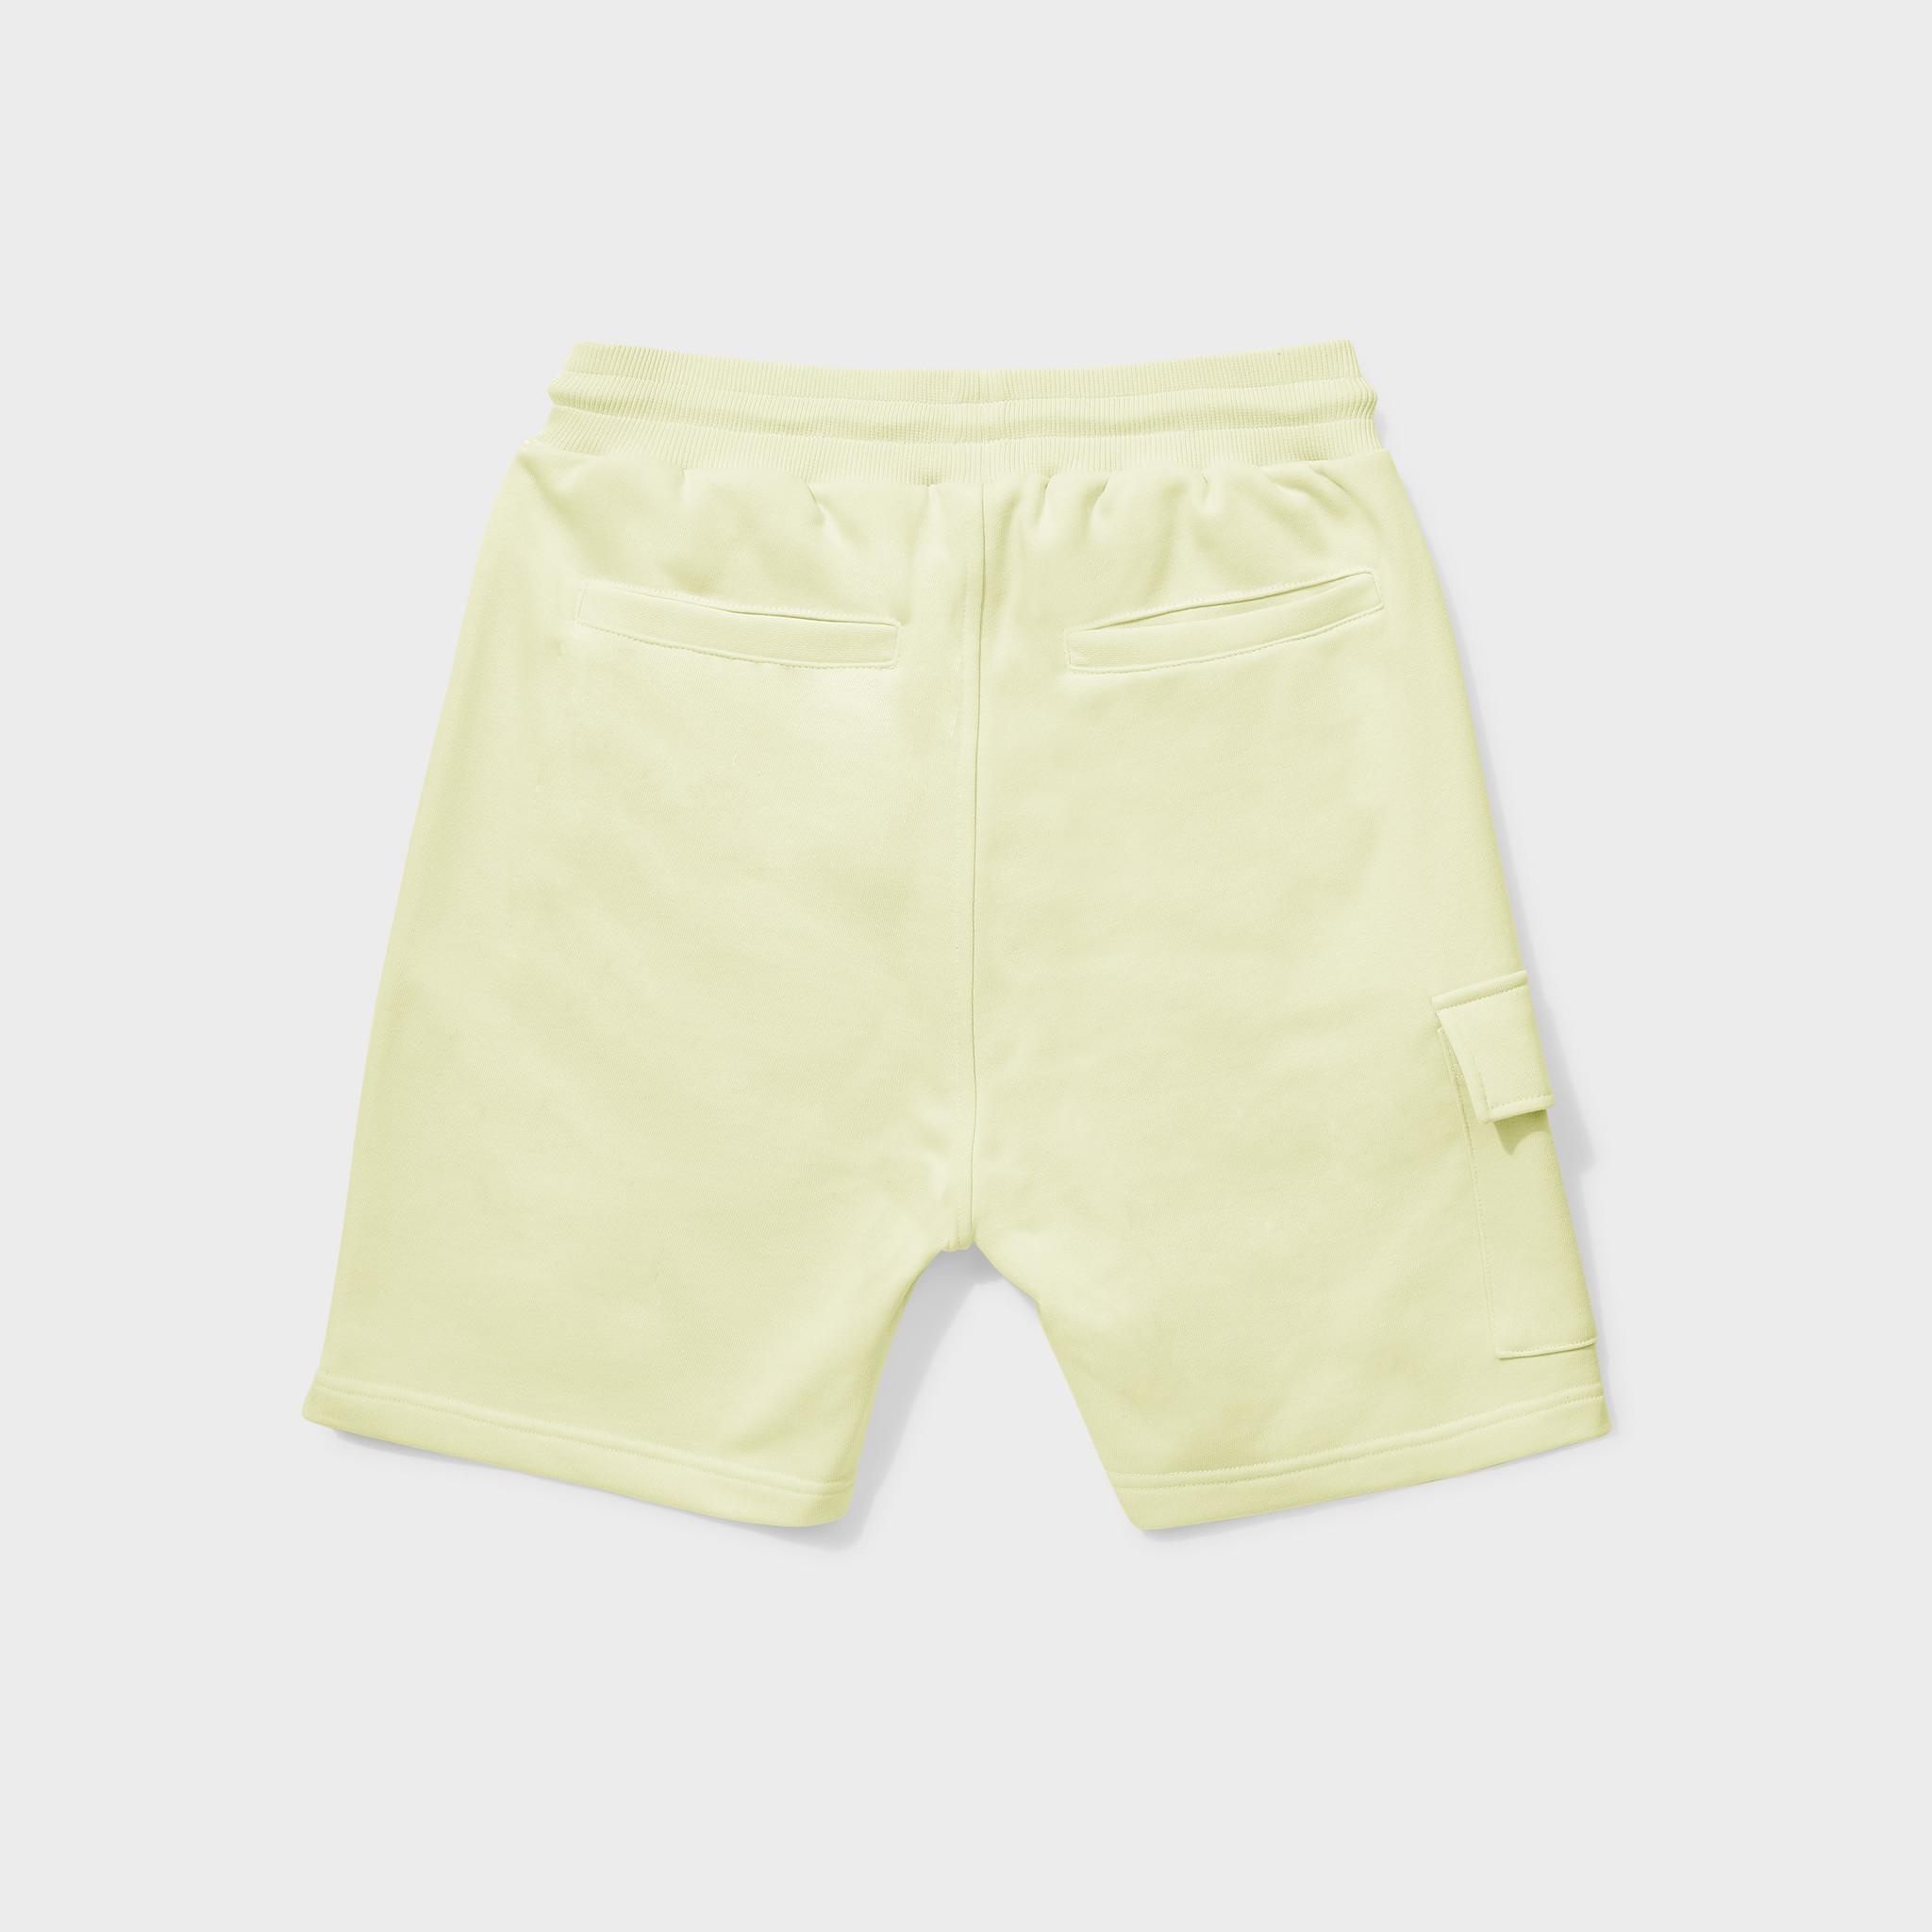 Travis shorts yellow-2